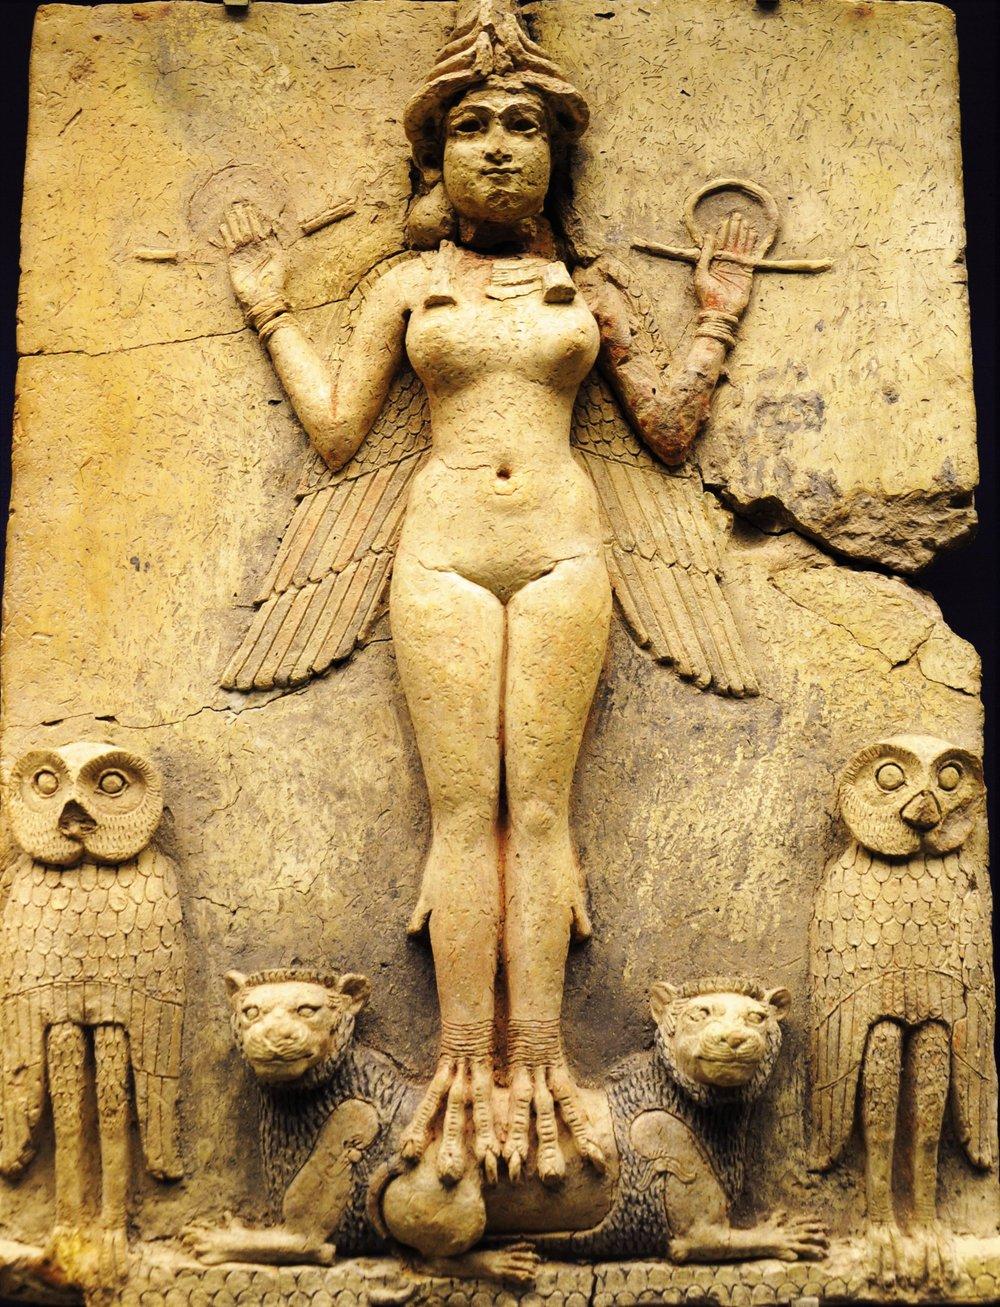 Lilith_Relief_Babylon_-1800-1750.JPG